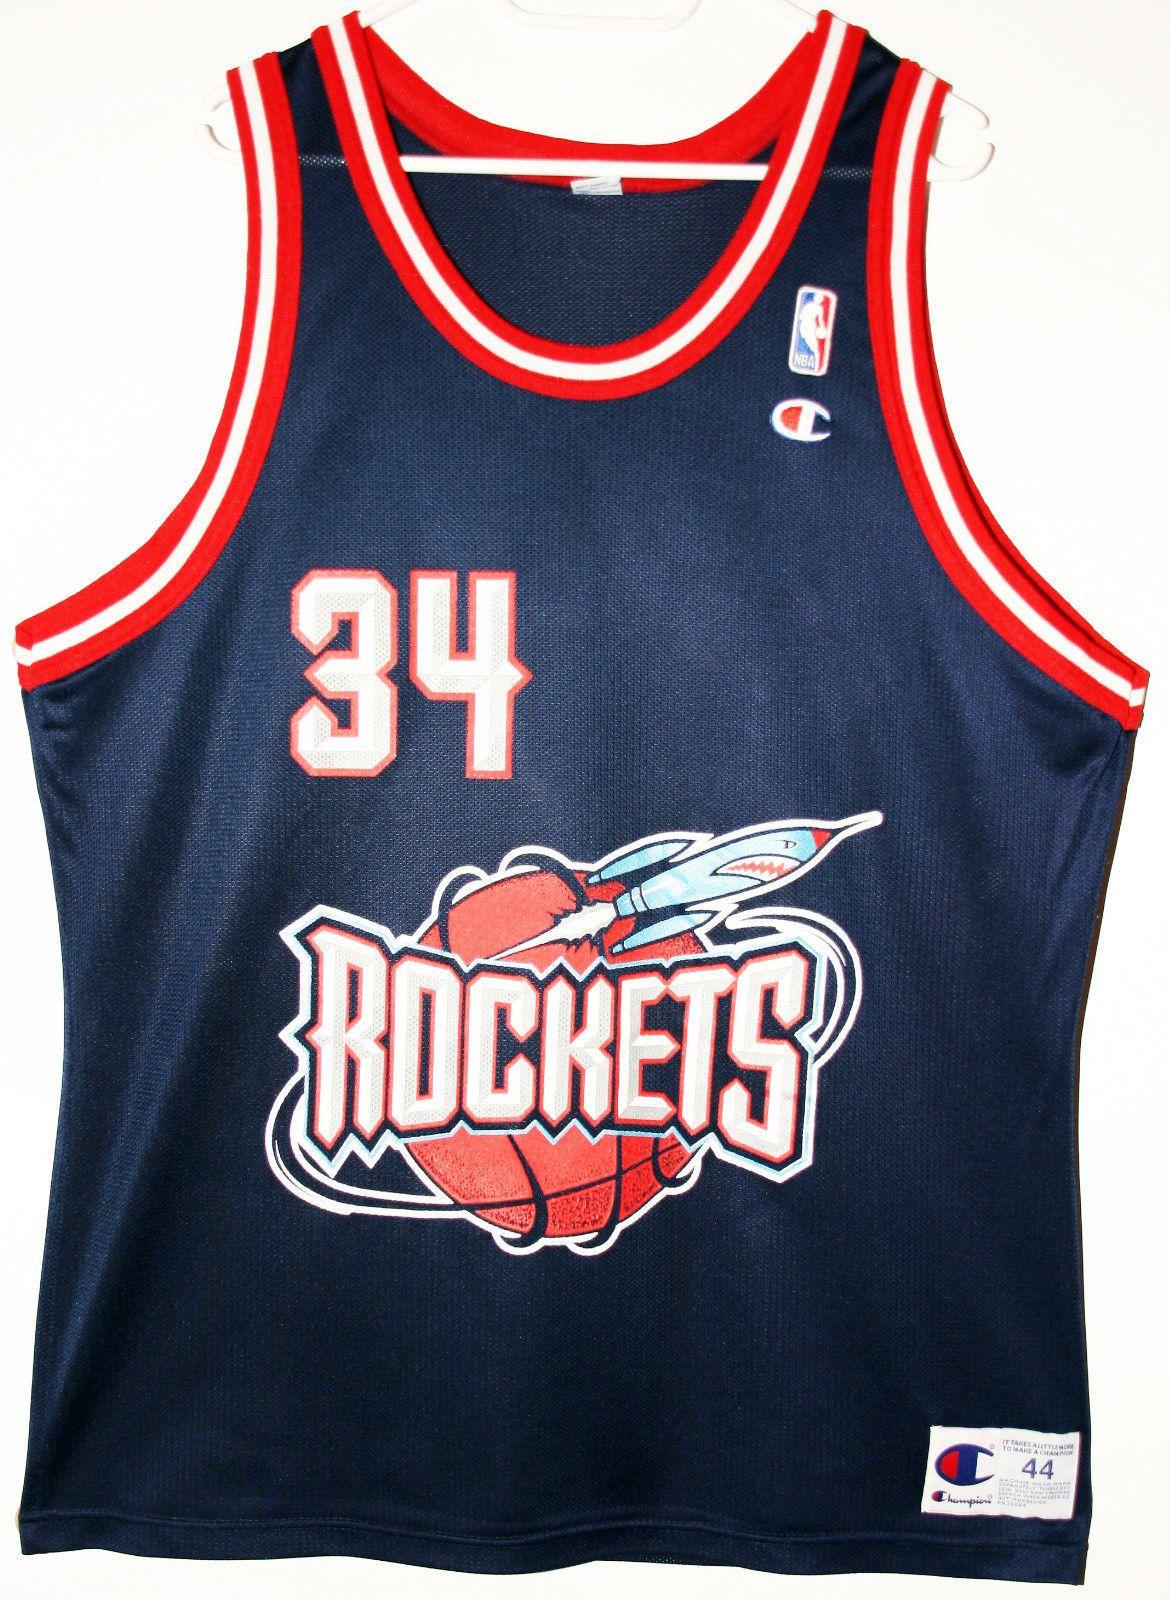 low priced f8f2f 468ad 34 hakeem olajuwon jersey ebay